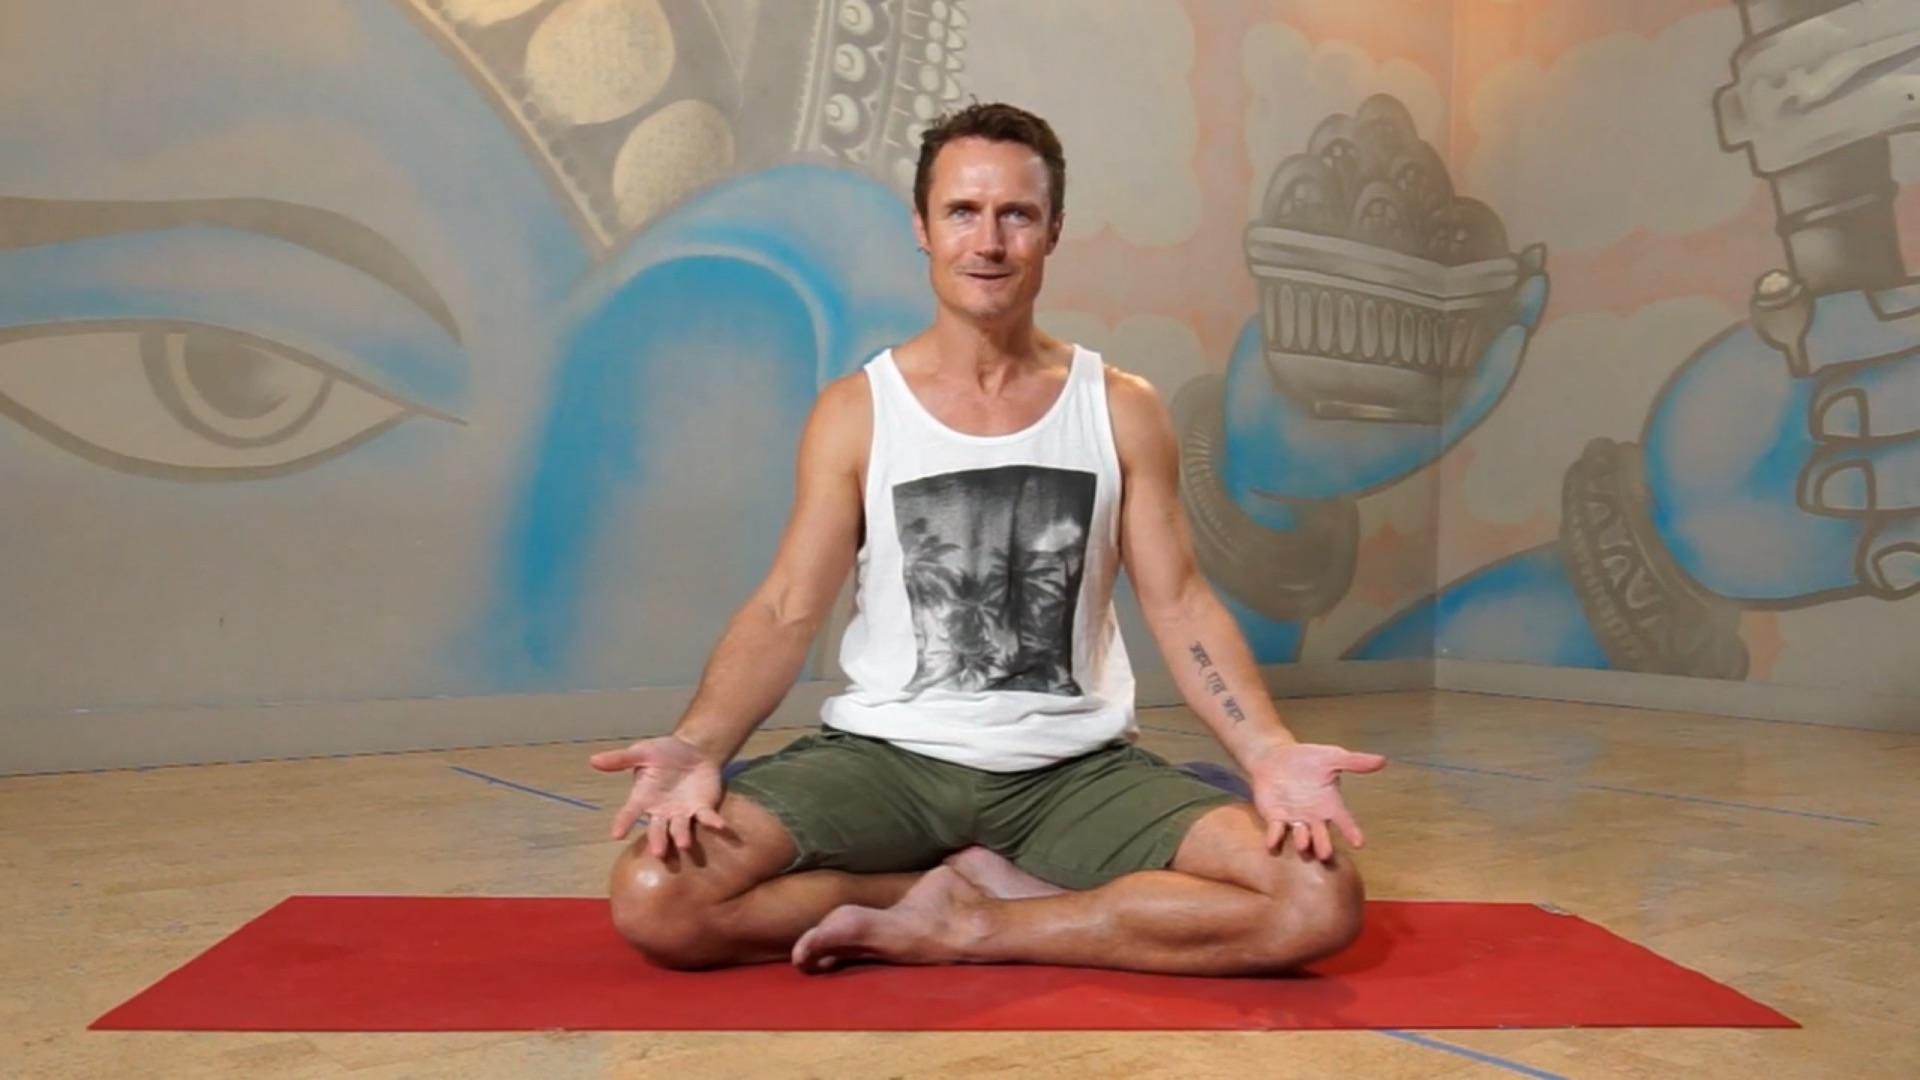 gratitude keenan crisp inspiration Power Living Australia Yoga YOGAHOLICS